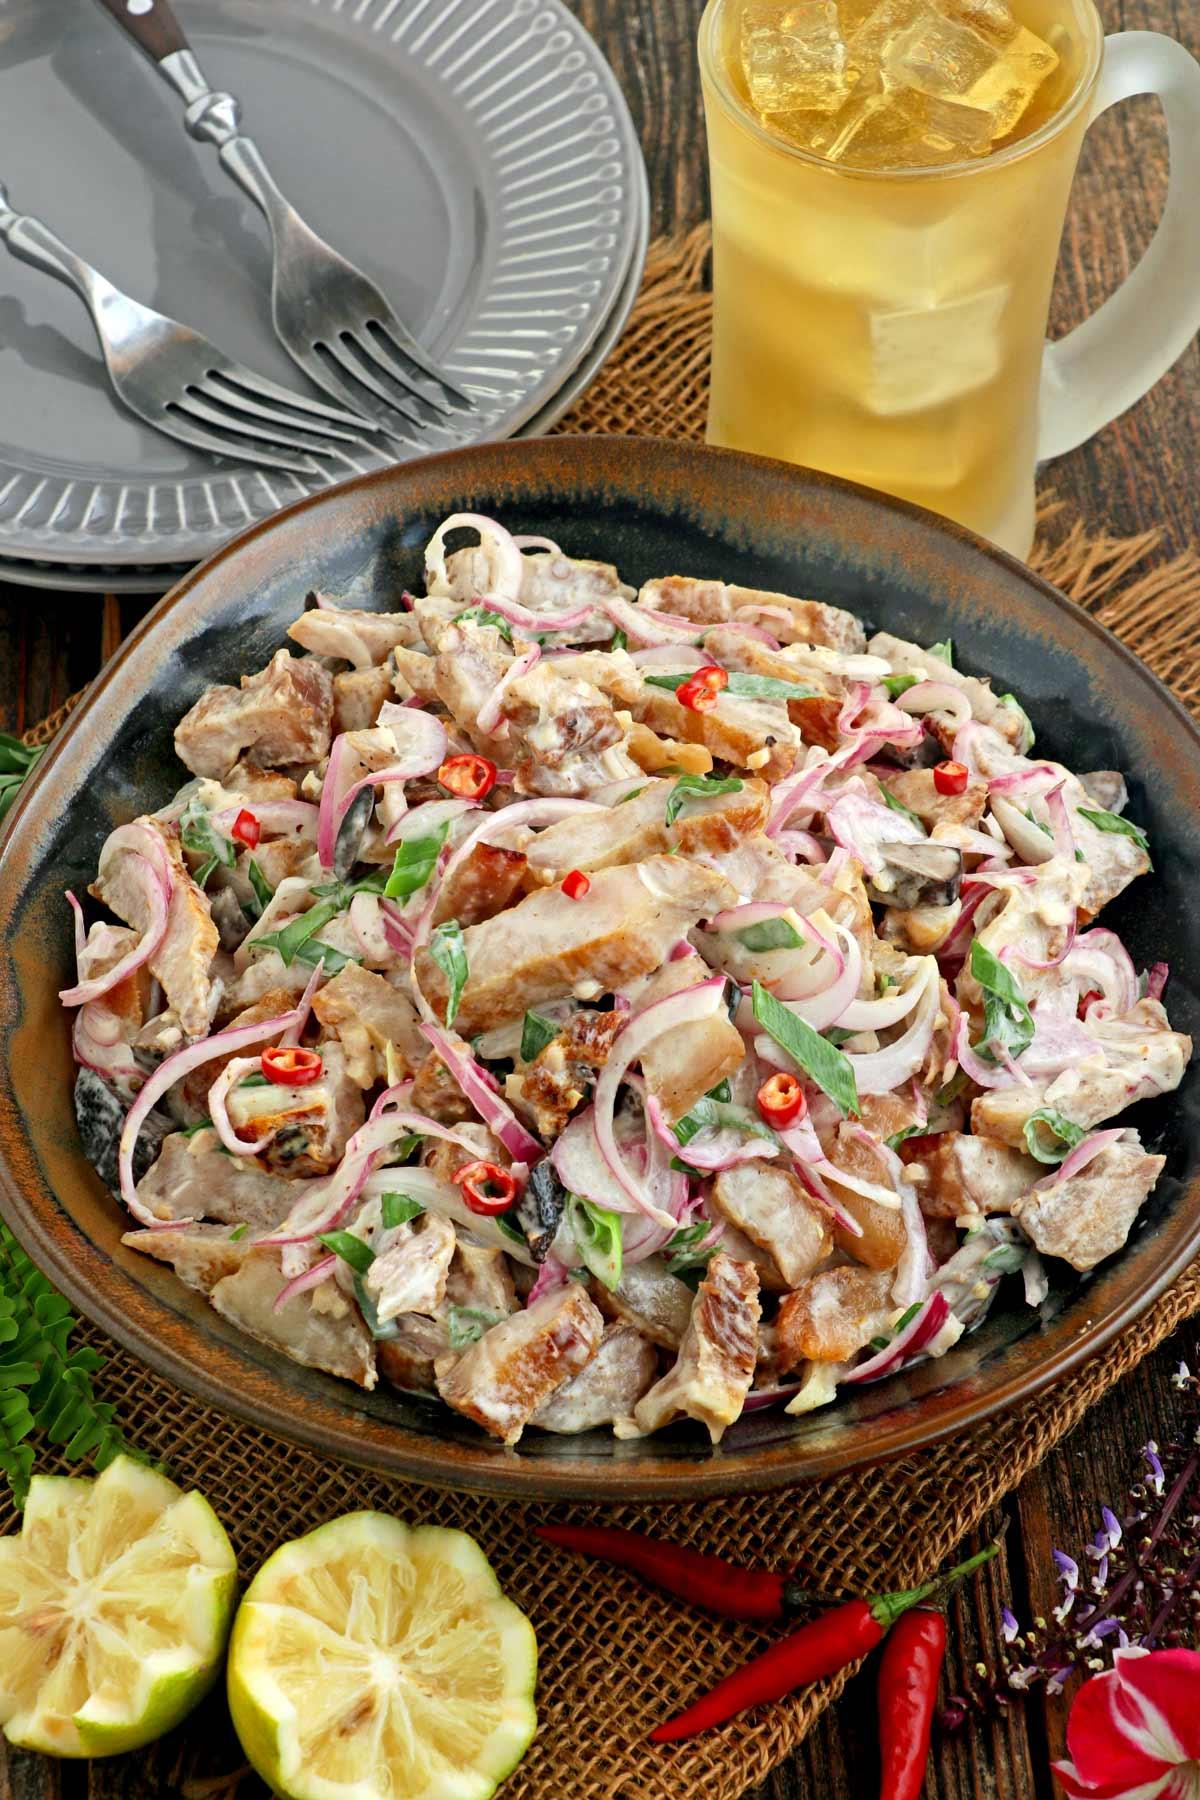 Ilocano Dinakdakan dish on a plate.